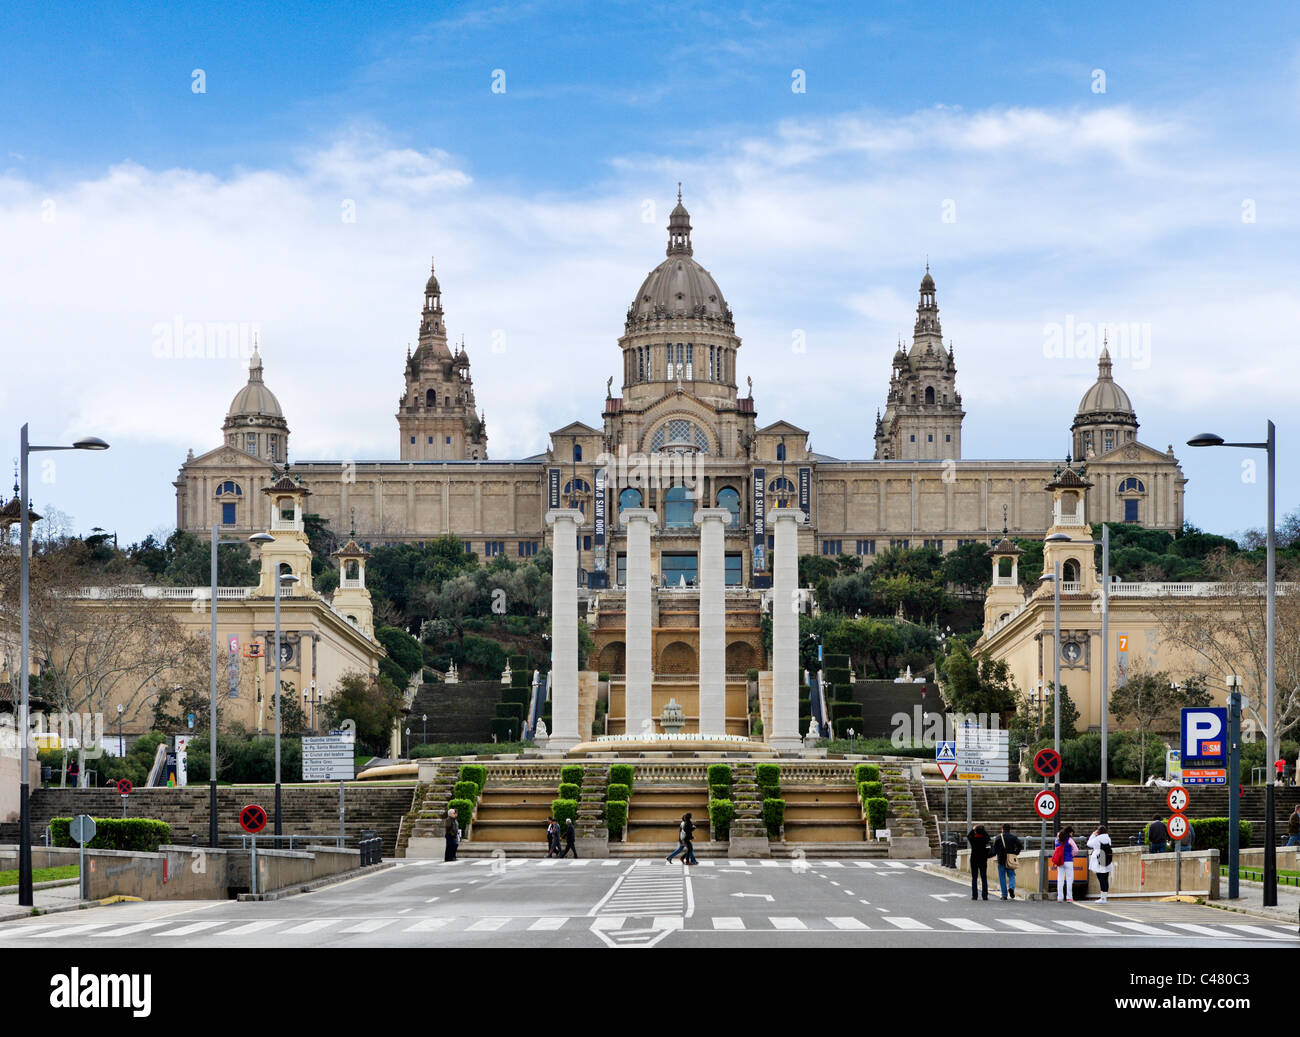 Der Palau Nacional, Montjuic, Barcelona, Katalonien, Spanien Stockbild